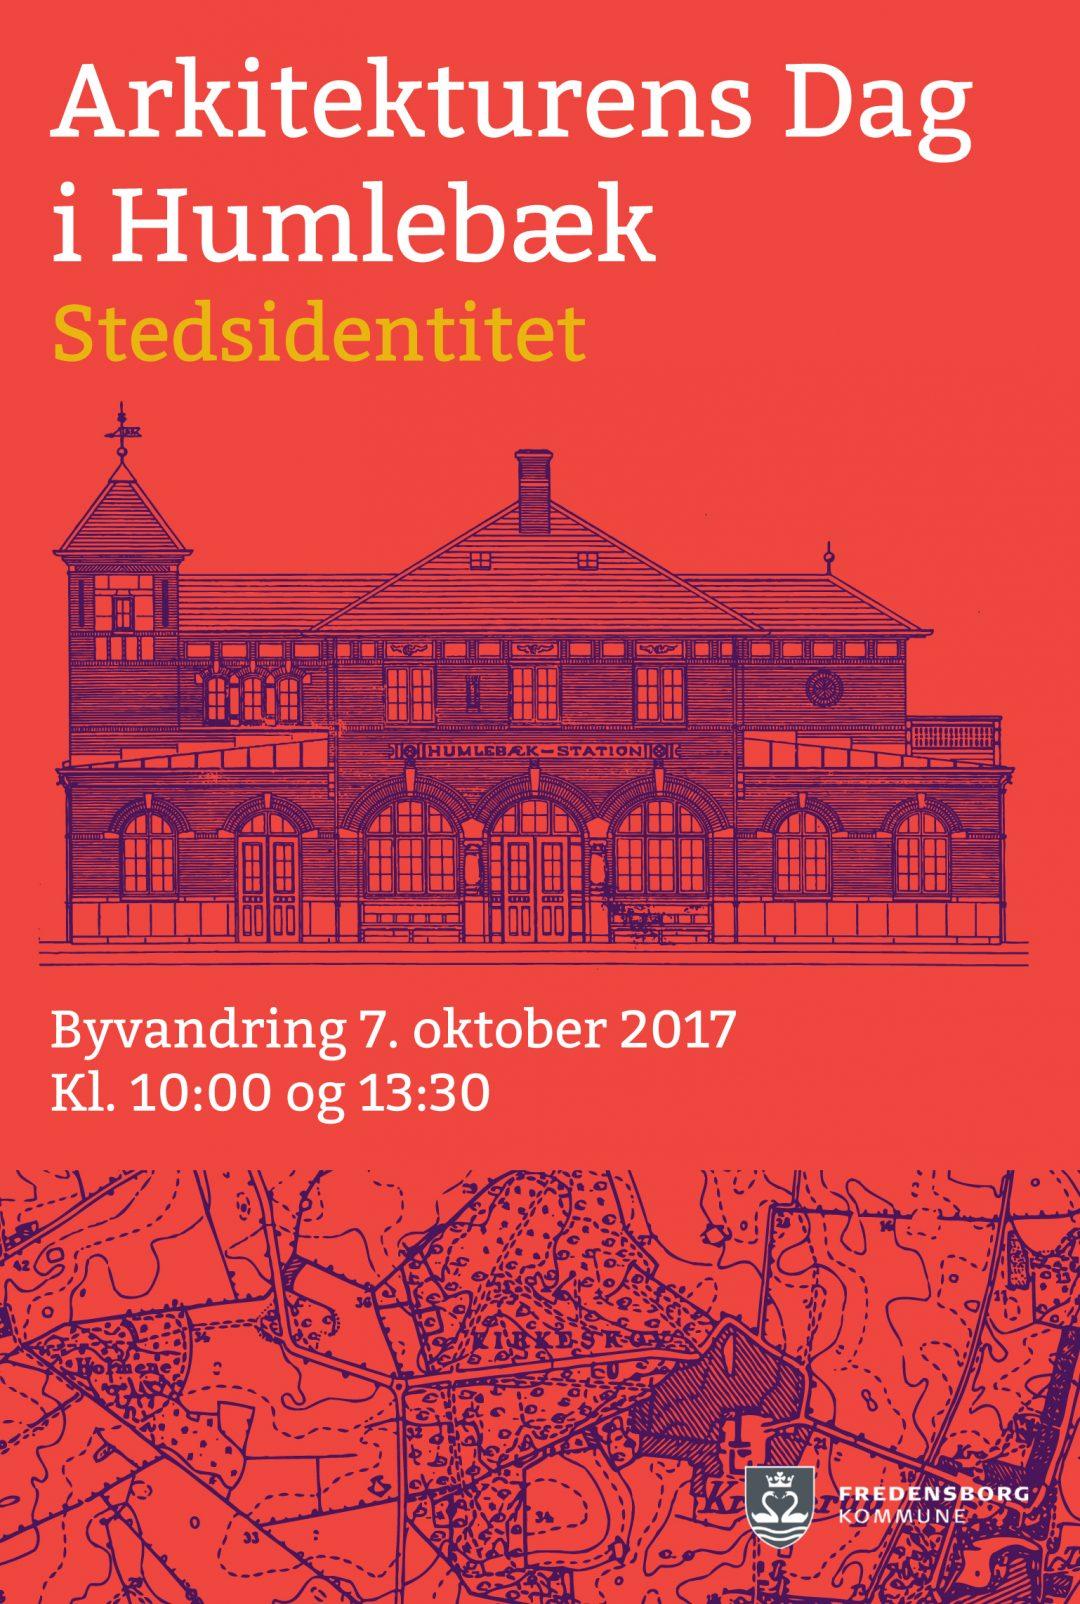 Arkitekturens Dag i Humlebæk